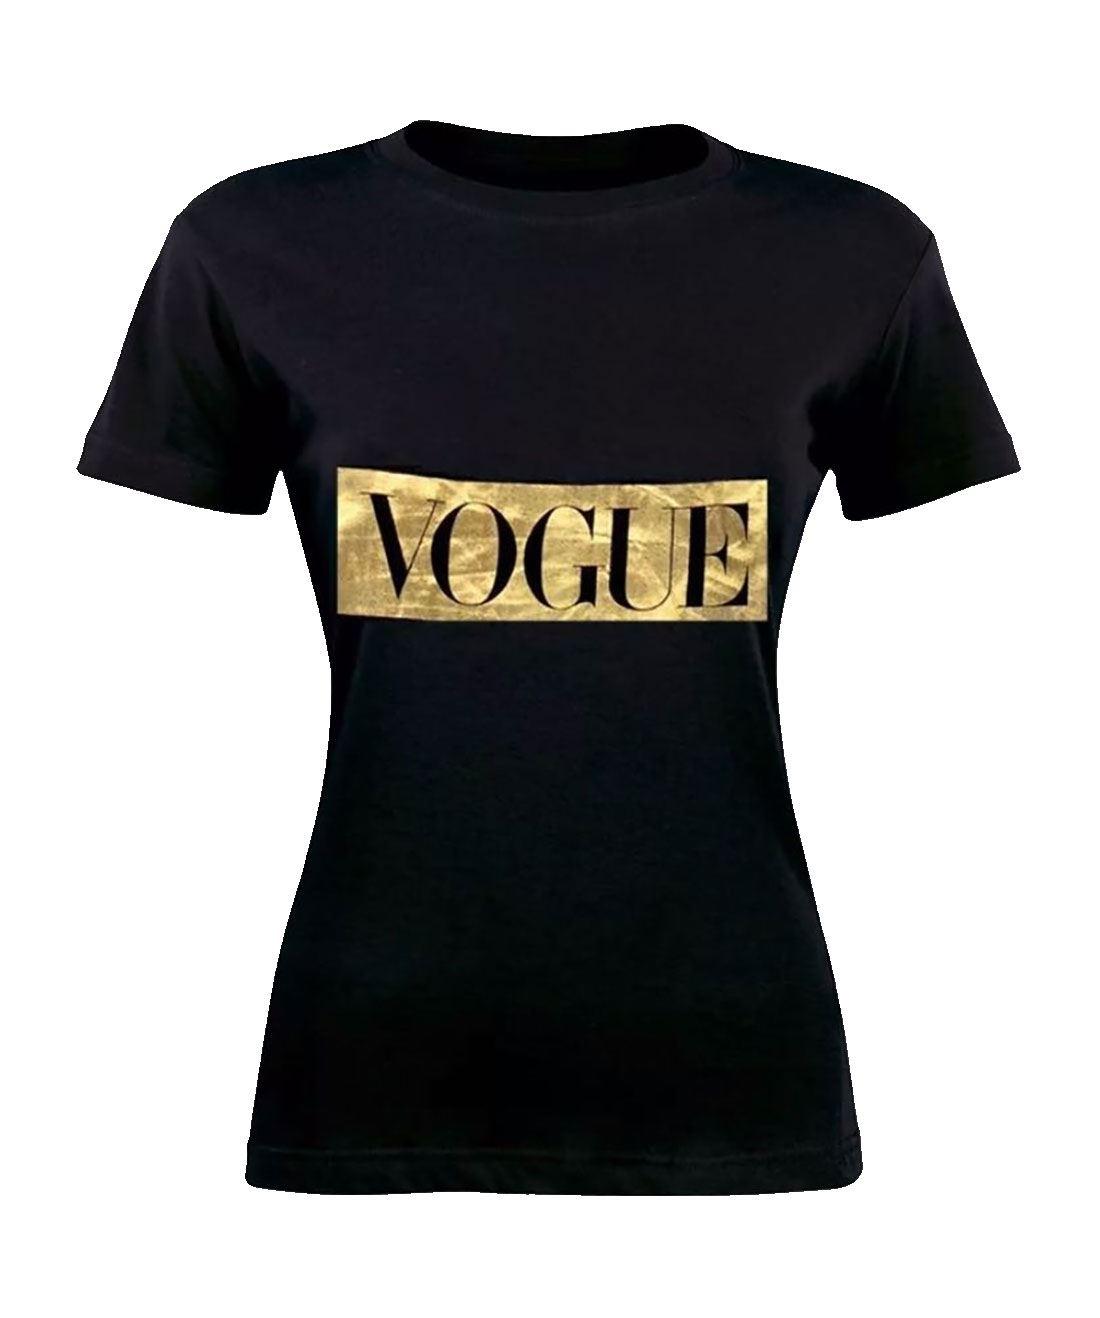 Vogue-Celebrity-Inspired-Print-T-Shirt-Womens-Short-Sleeve-Slogan-Gold-Foil-Top